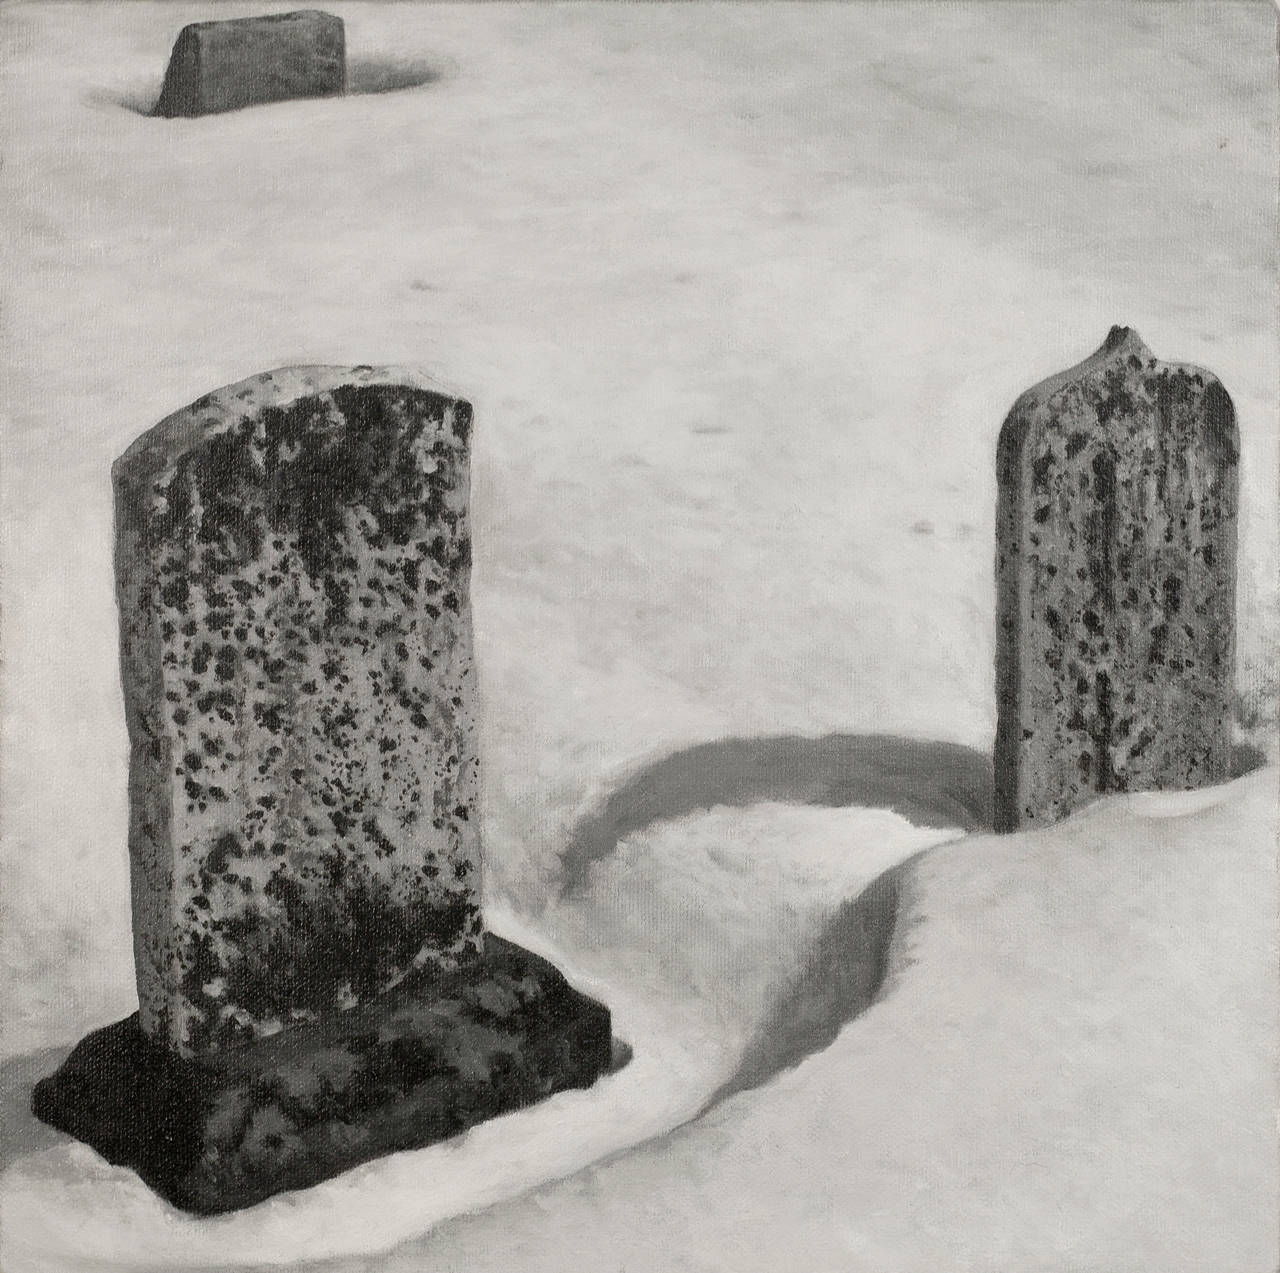 Graves in Snow # 1